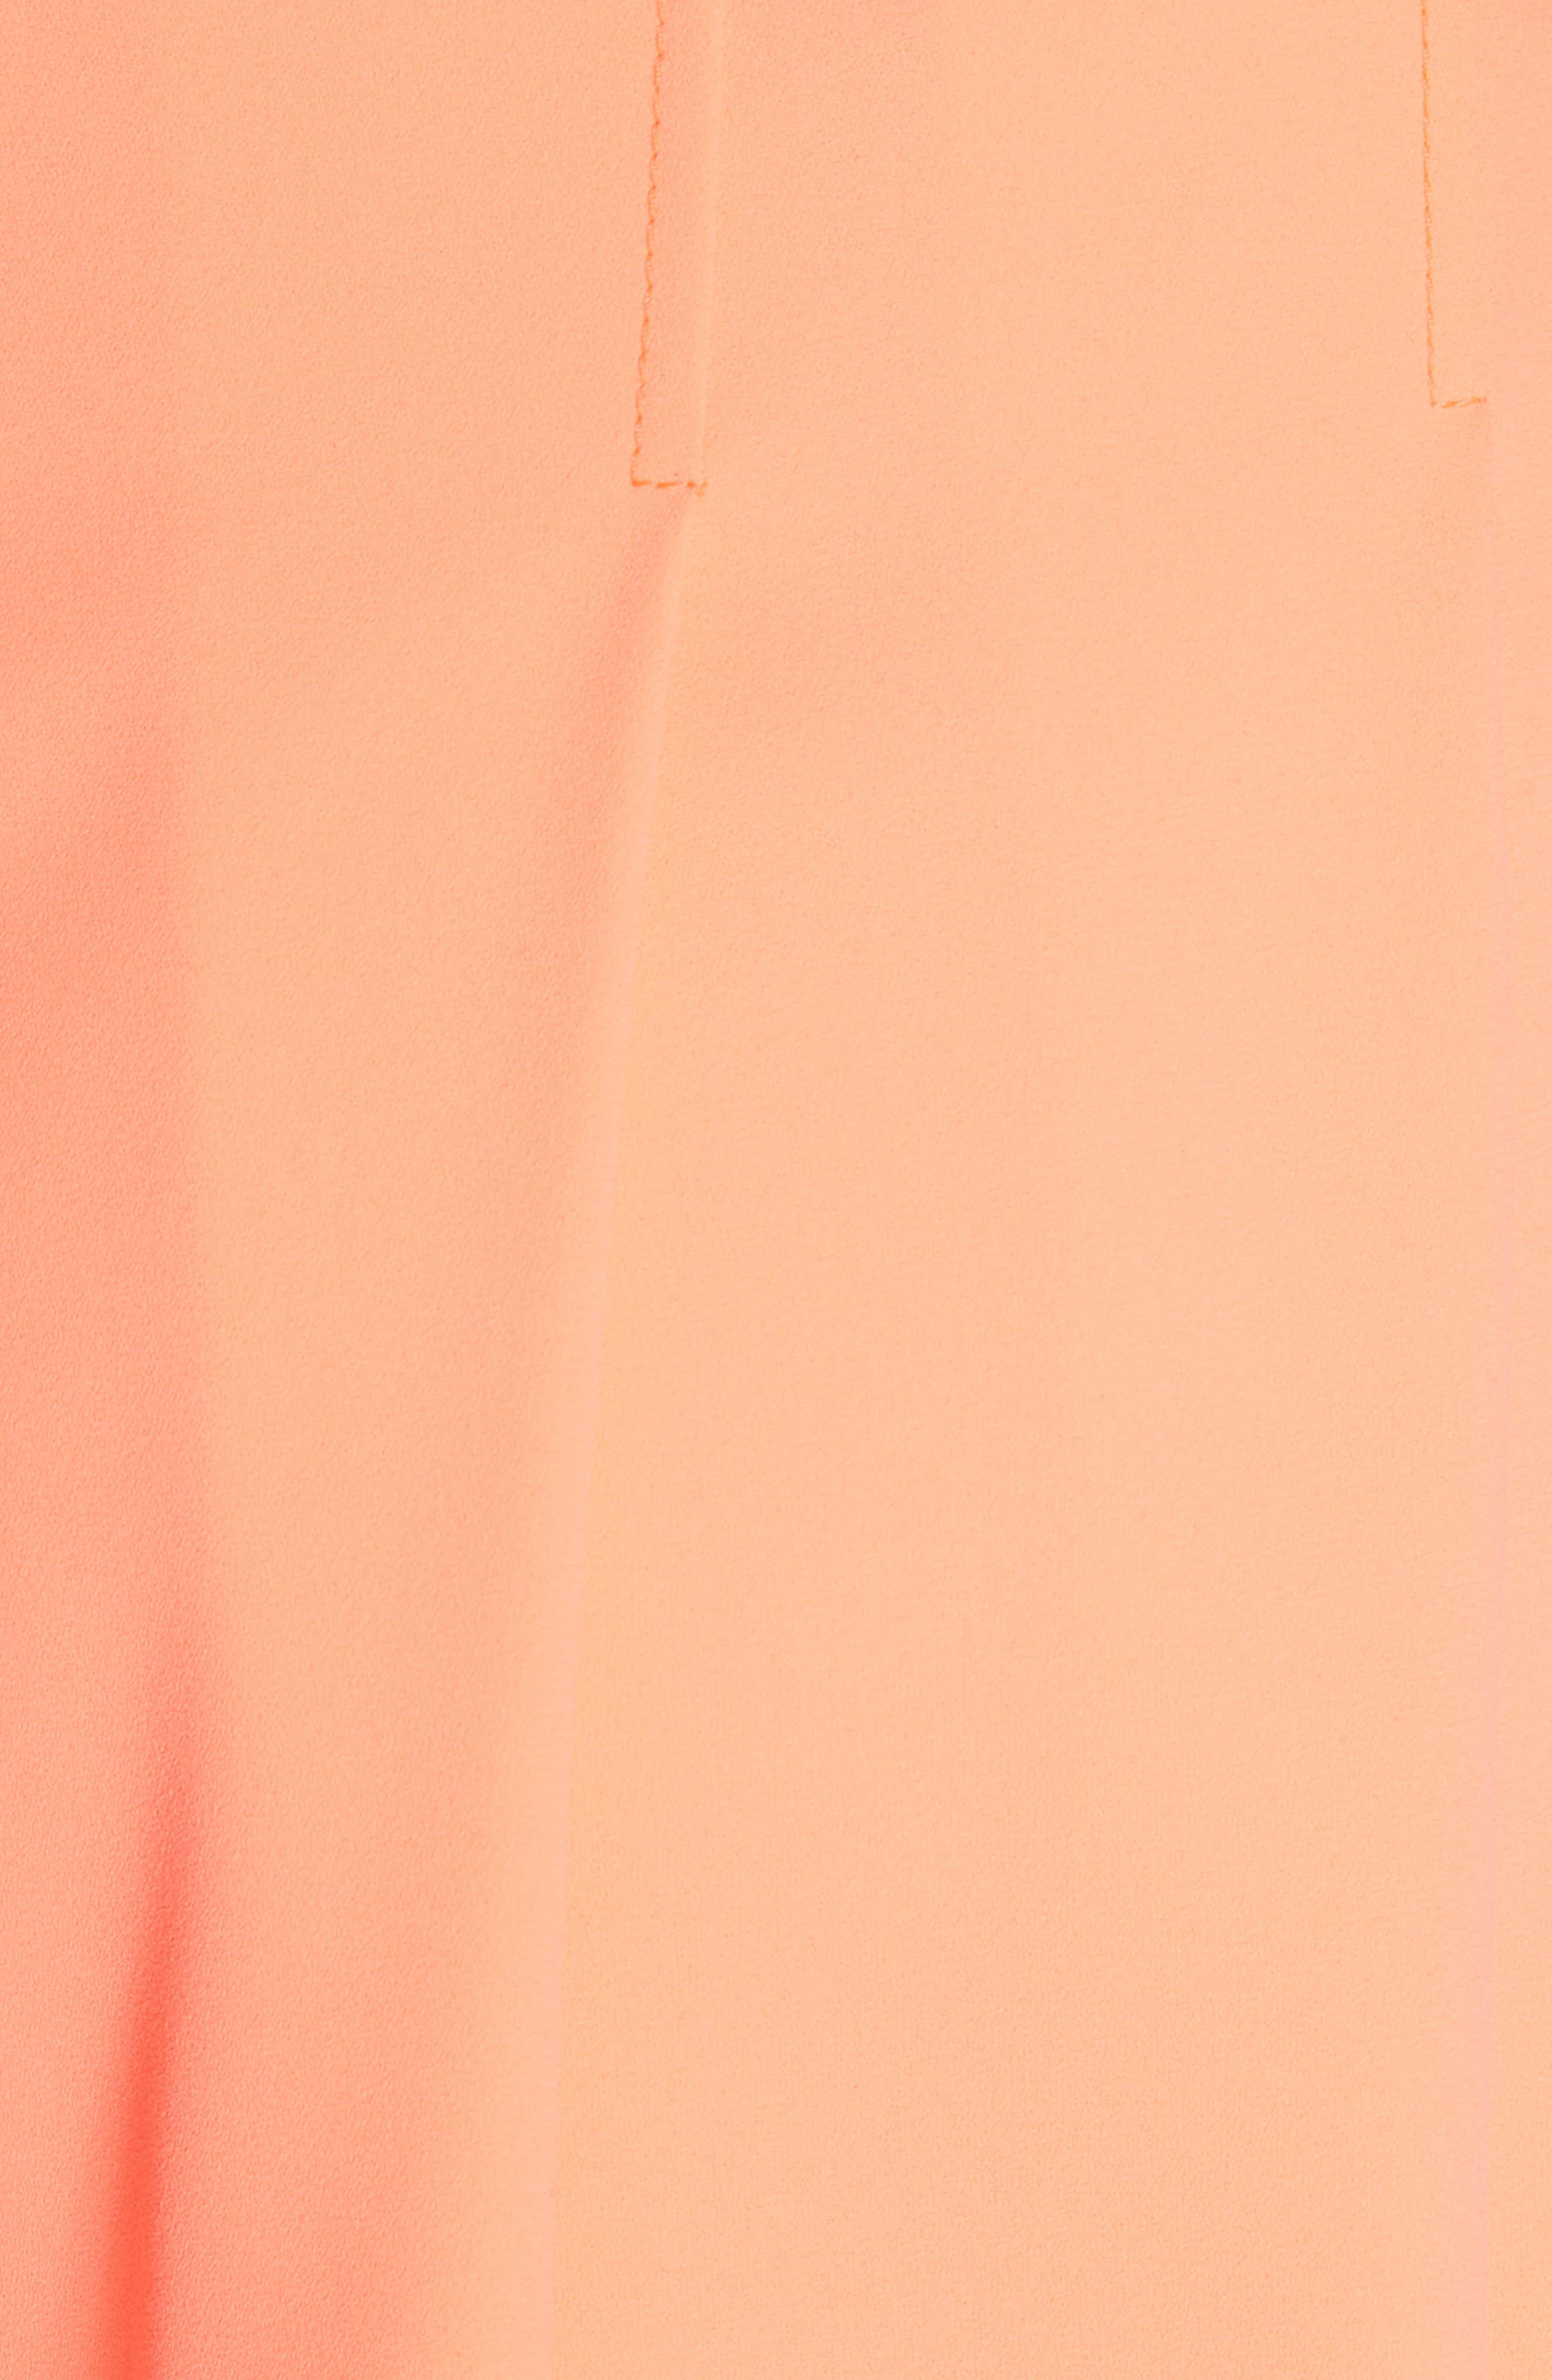 Scarlet Flutter Shorts,                             Alternate thumbnail 5, color,                             Neon Coral